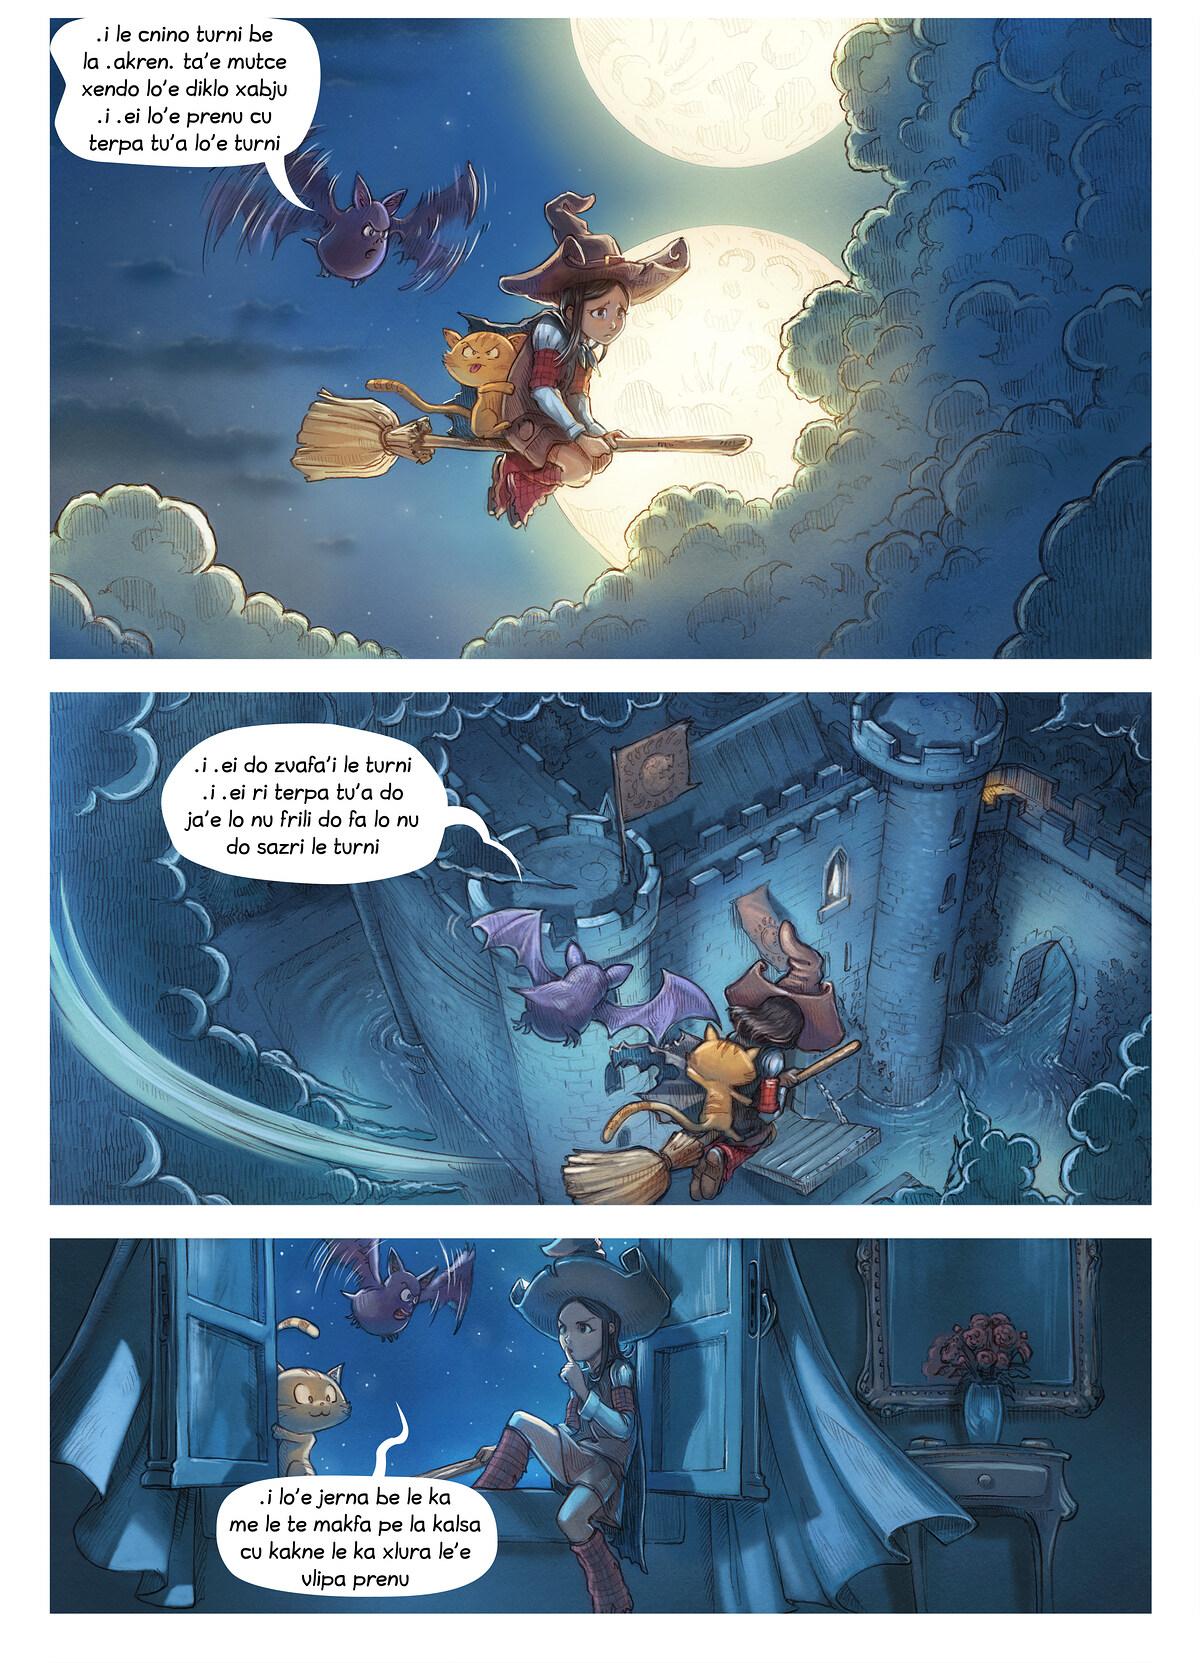 i 11 mo'o lisri le te makfa pe la kalsa, Page 3